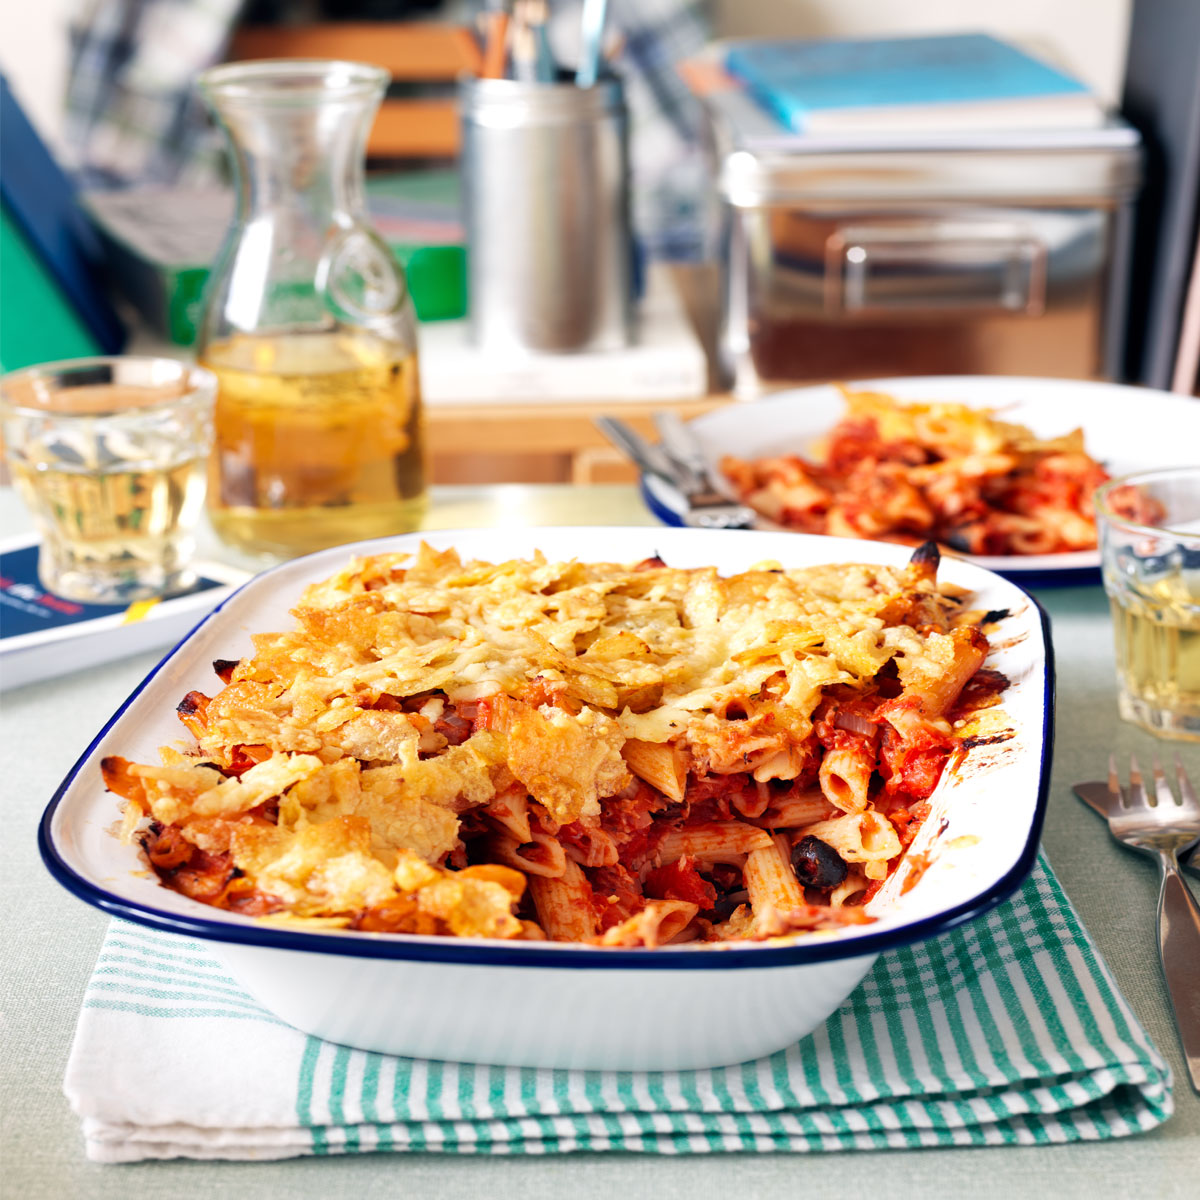 Good Meals To Cook: Student Cooking Essentials